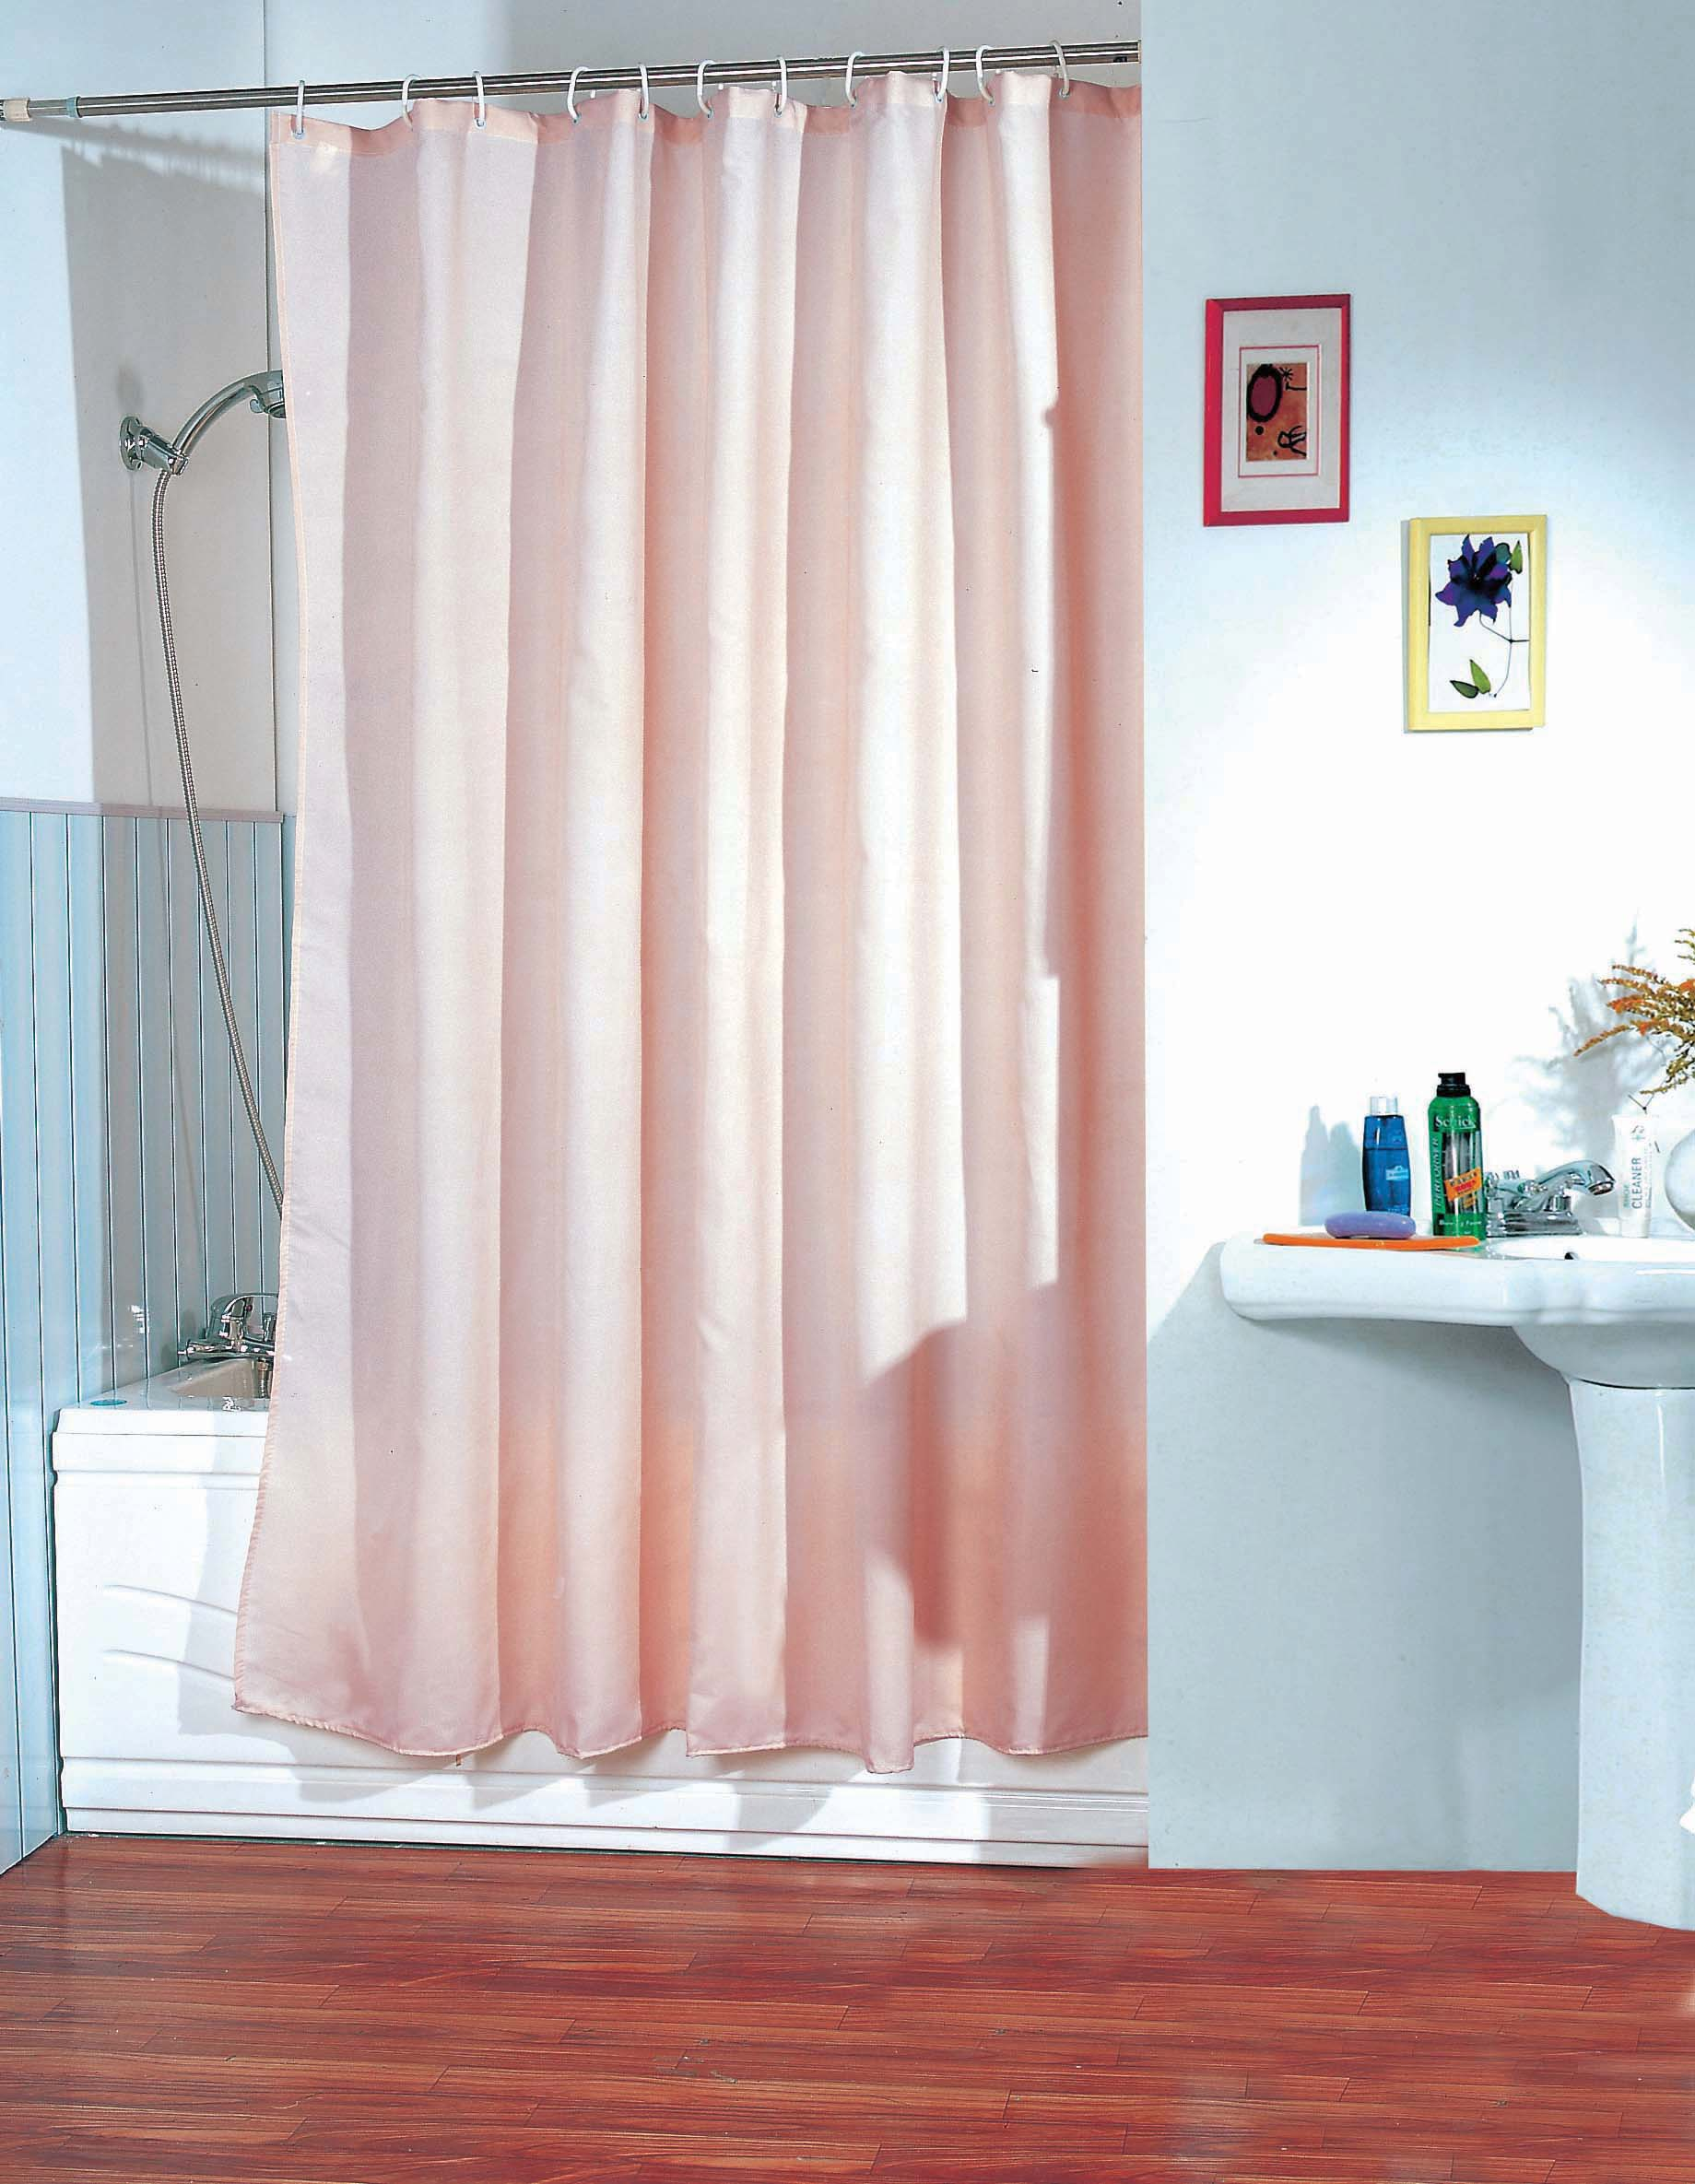 MSV Duschvorhang 180x200cm Anti Schimmel Textil Badewannenvorhang Wannenvorhang Lachs